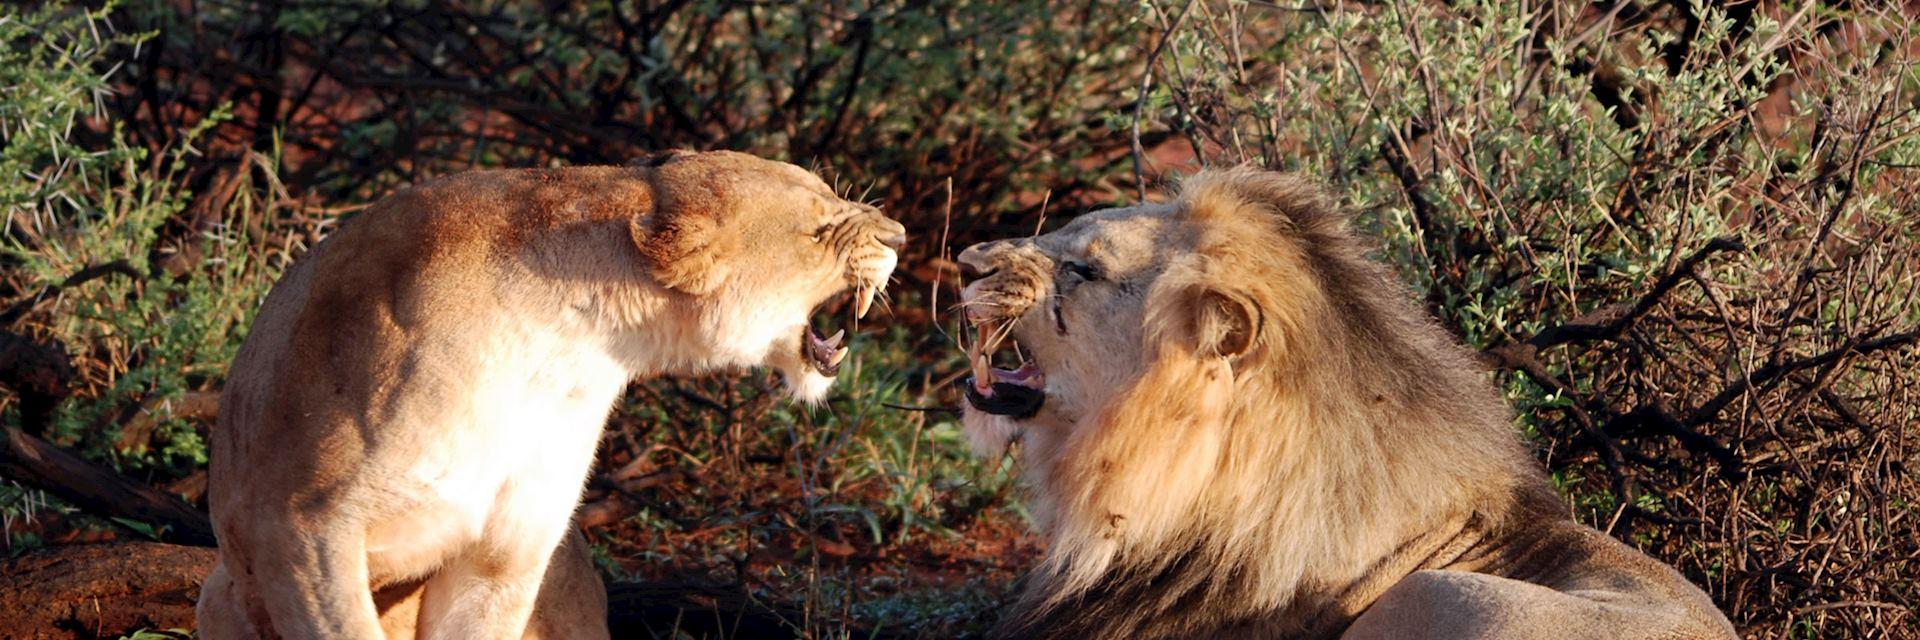 Lions, Madikwe Game Reserve